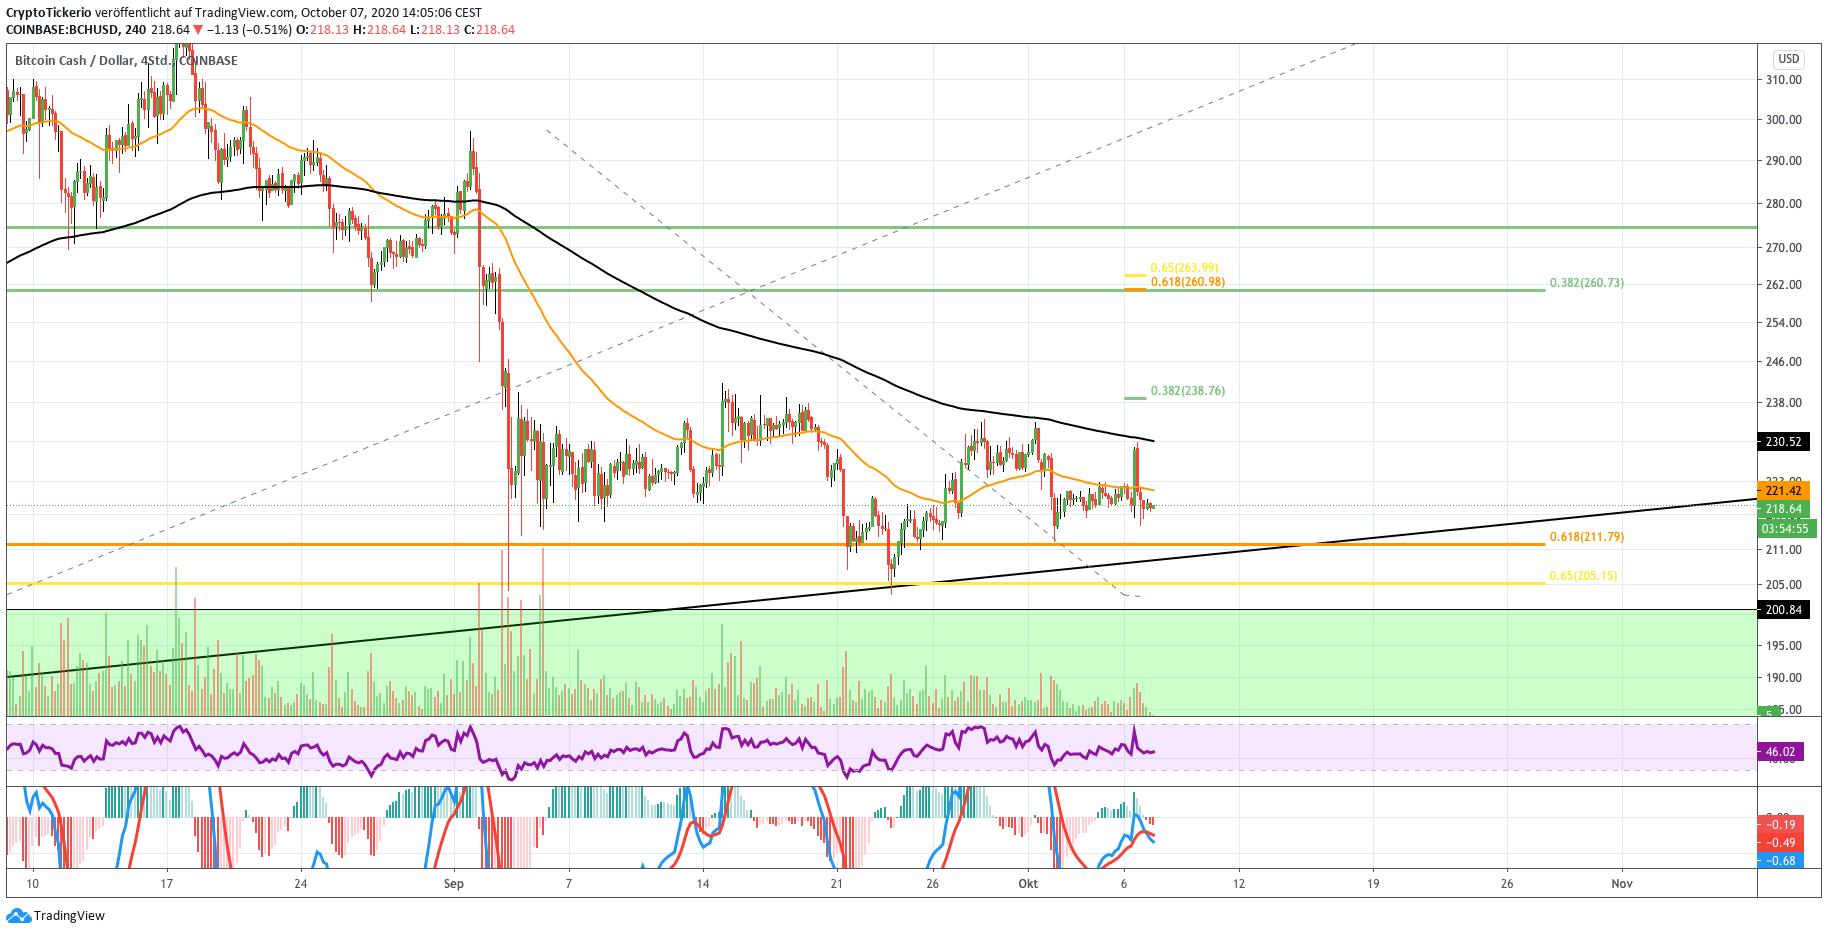 bitcoin cash kurs prognose